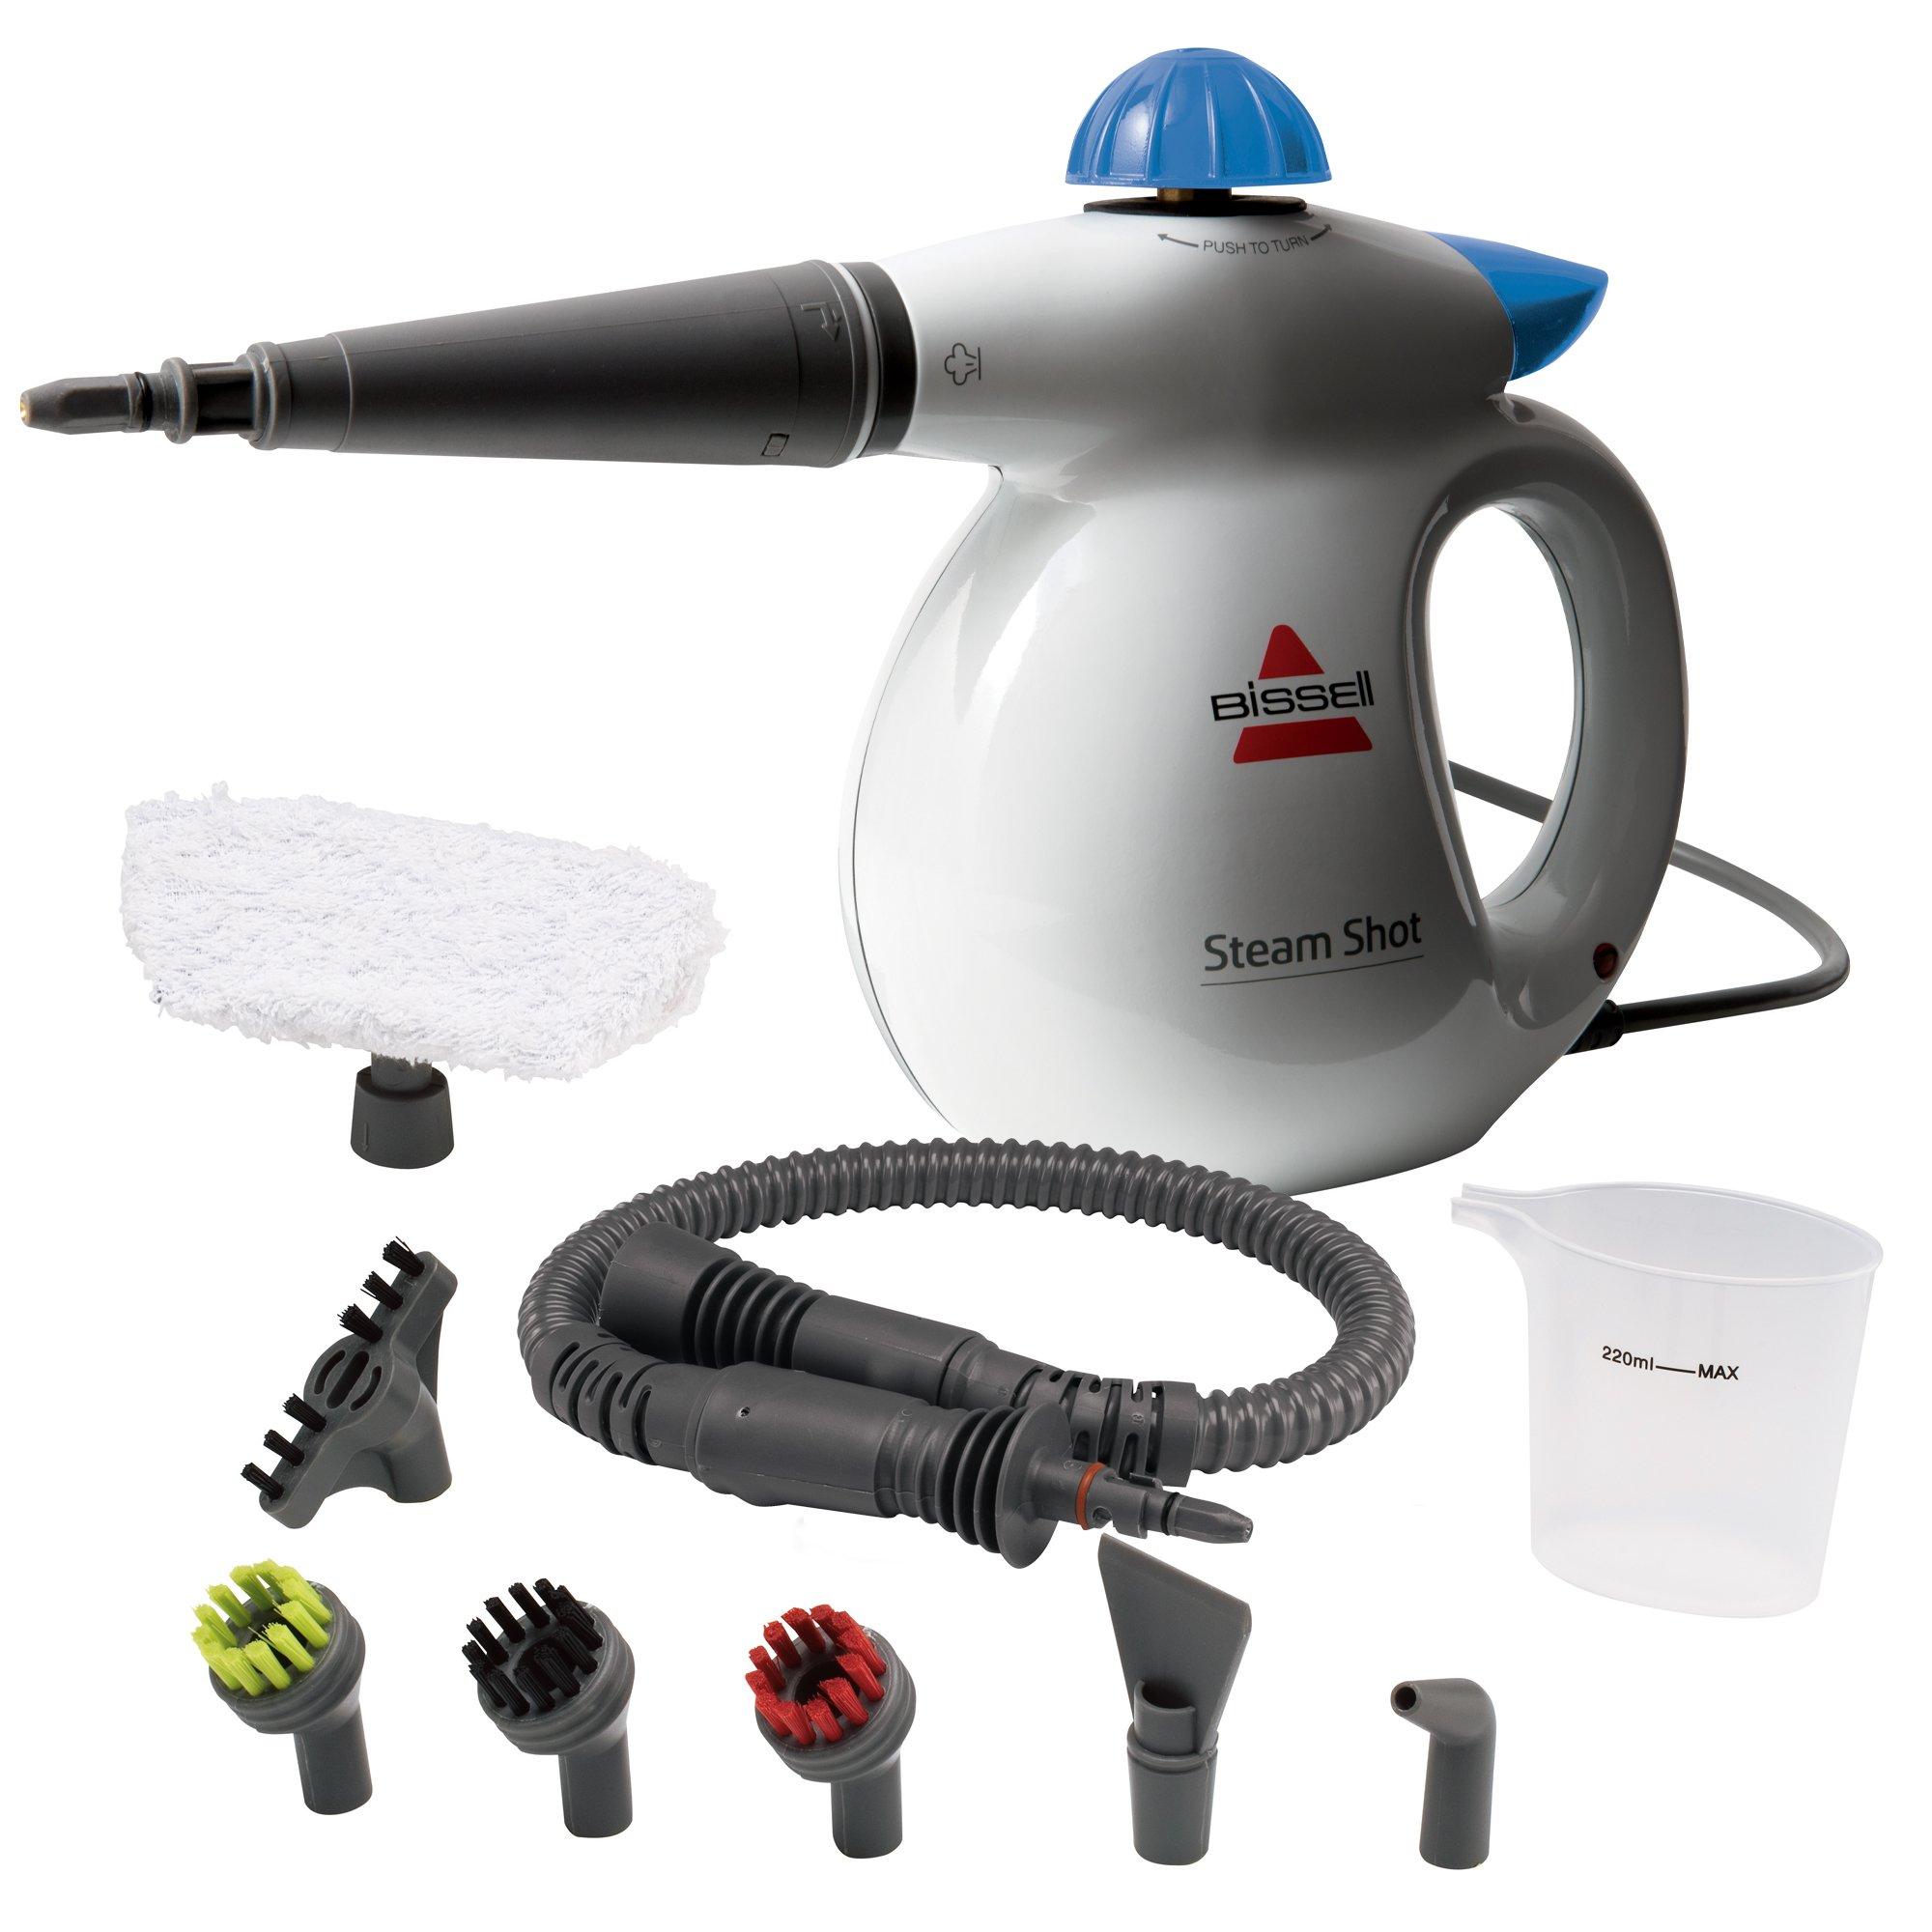 Bissell Steam ShotTM Hard Surface Cleaner 39N7-8